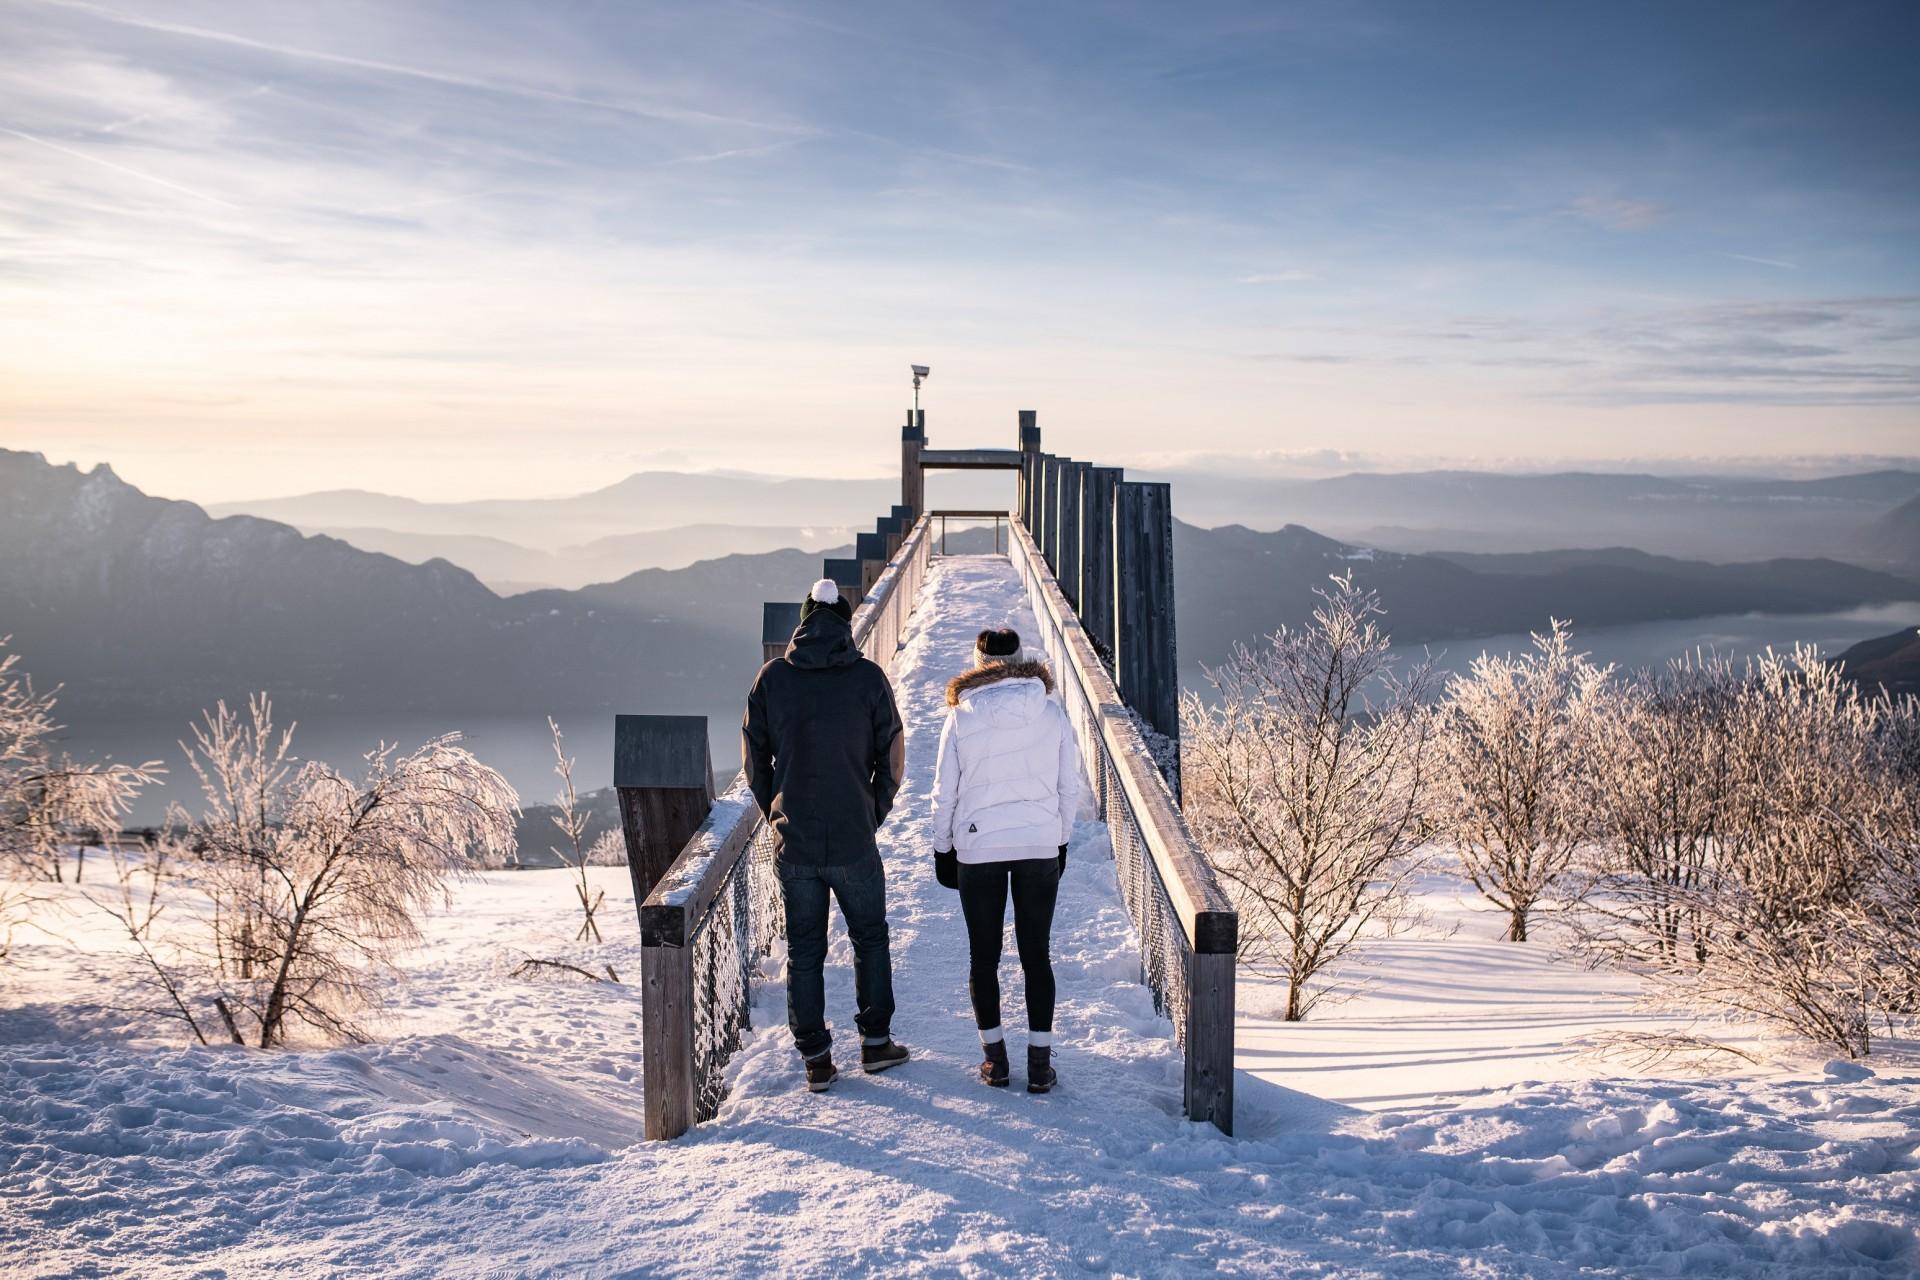 savoie-grand-revard-hiver-2019-peignee-verticale-440